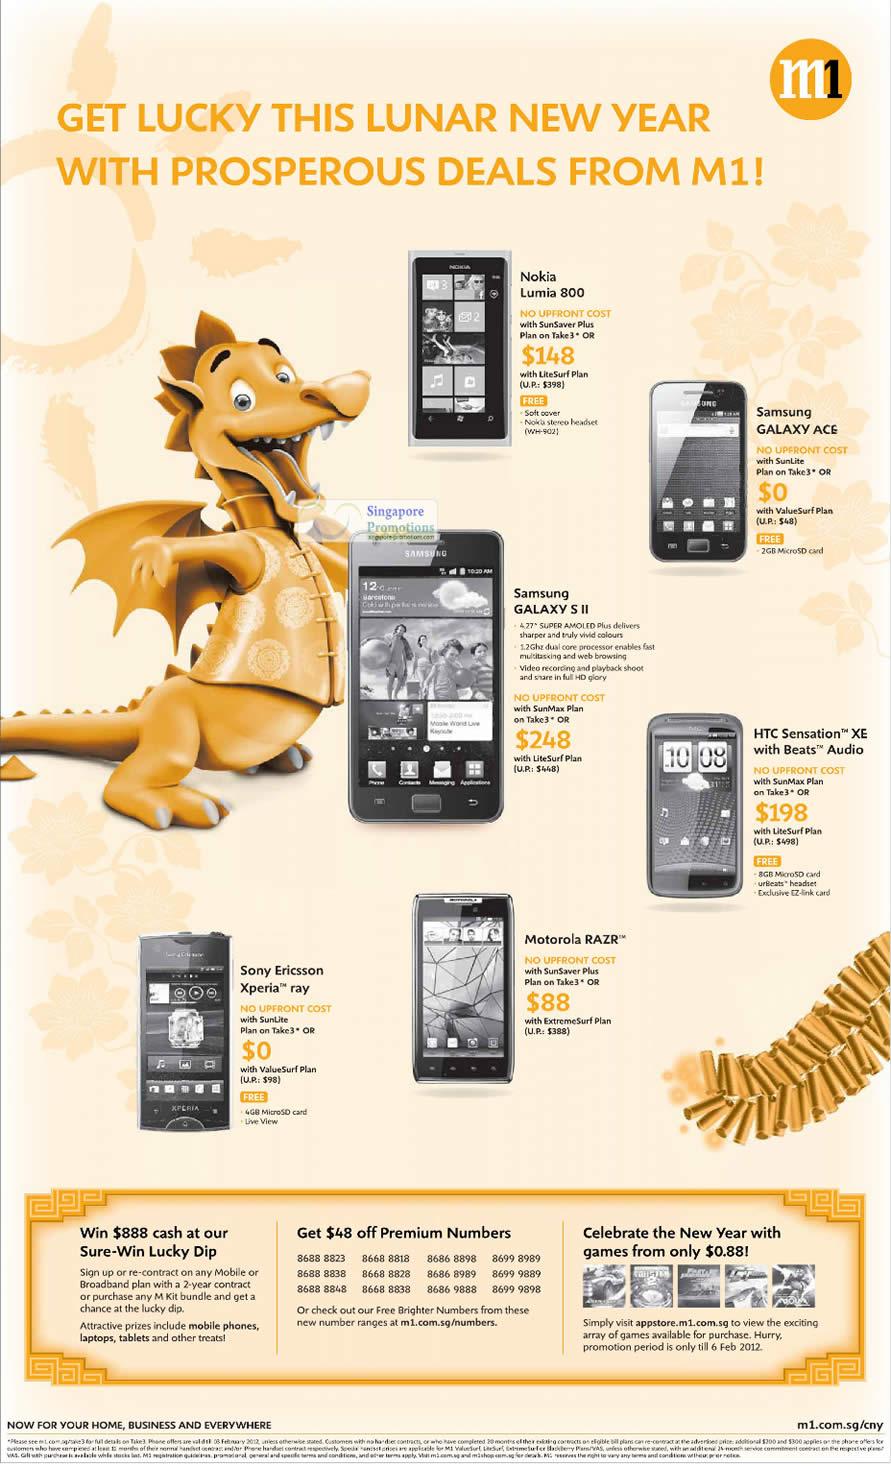 Nokia Lumia 800, Samsung Galaxy Ace, Galaxy S II, HTC Sensation XE, Motorola Razr, Sony Ericsson Xperia Ray